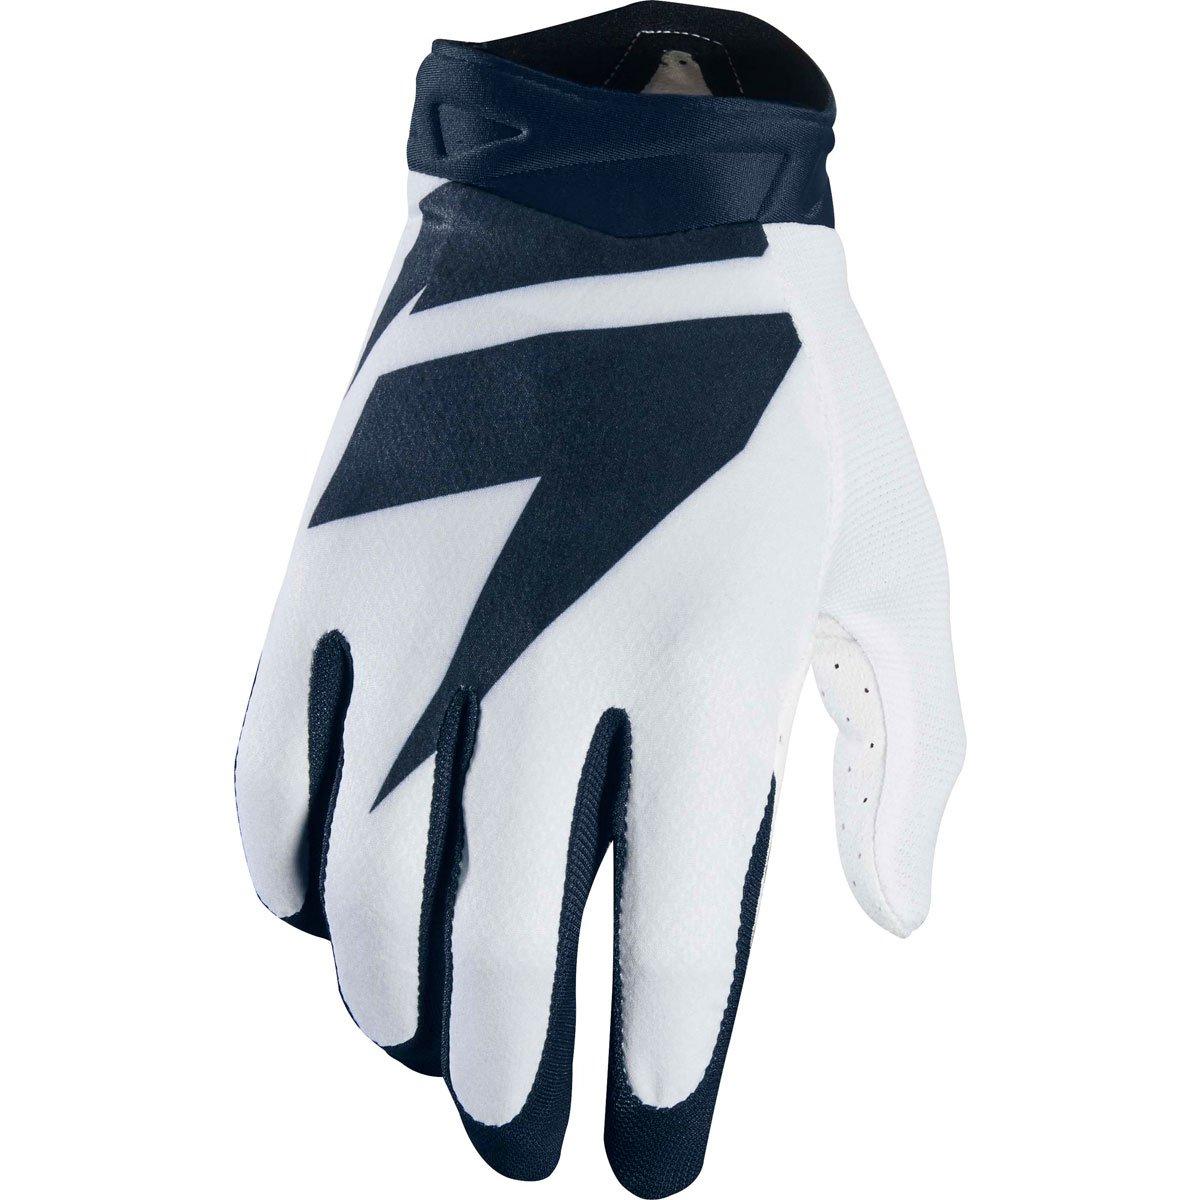 2018 Shift Black Label Air Gloves-White-M by Shift